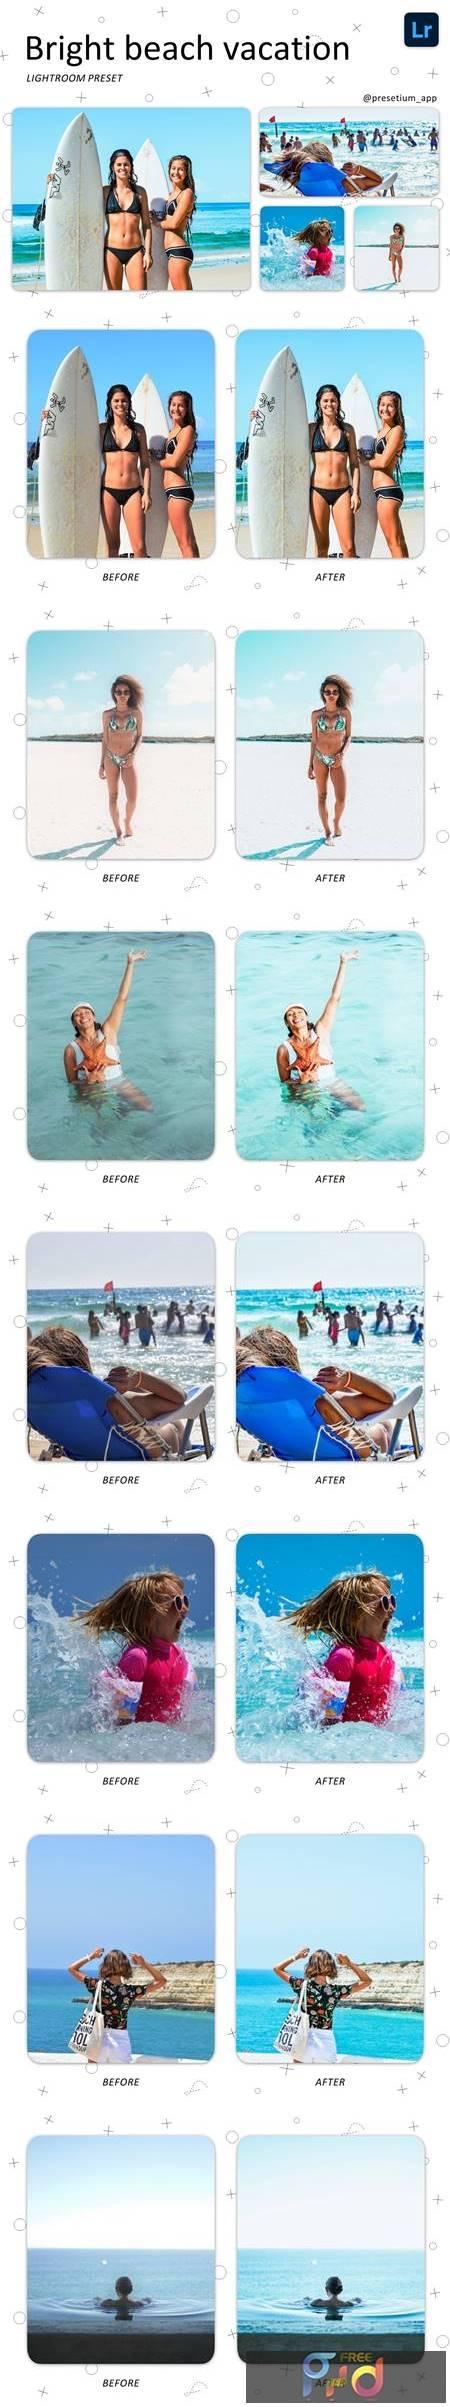 Beach Vacation - Lightroom Presets 5219377 1